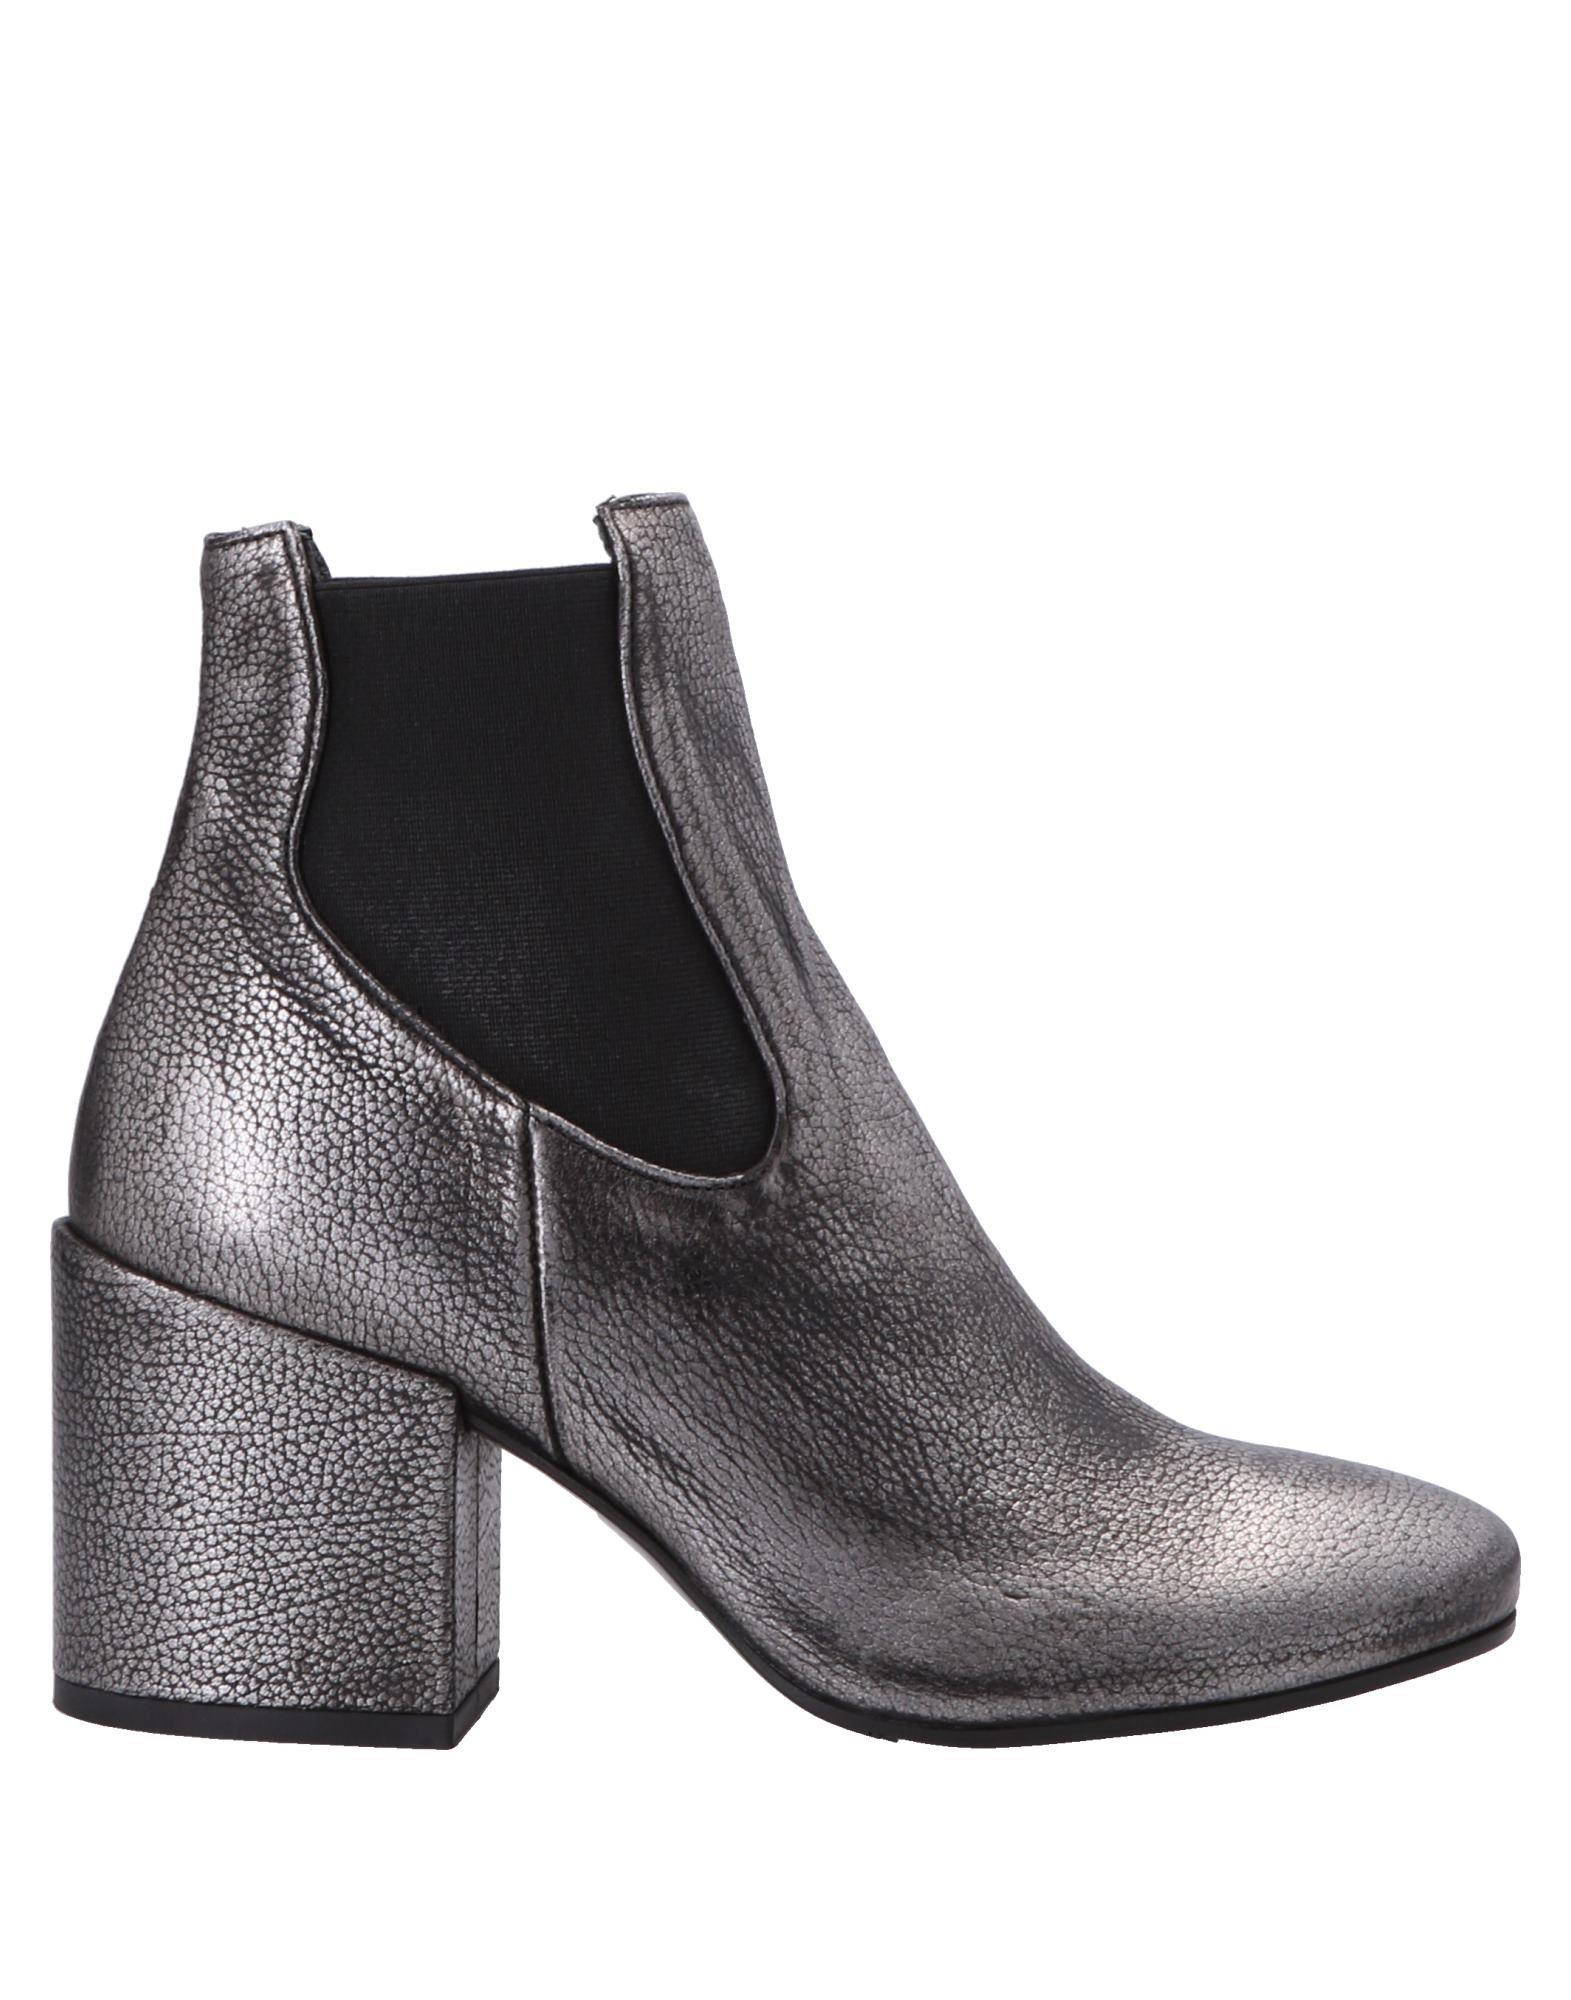 Juli Pascal Paris Stiefelette Damen  11546832XK Gute Qualität beliebte Schuhe